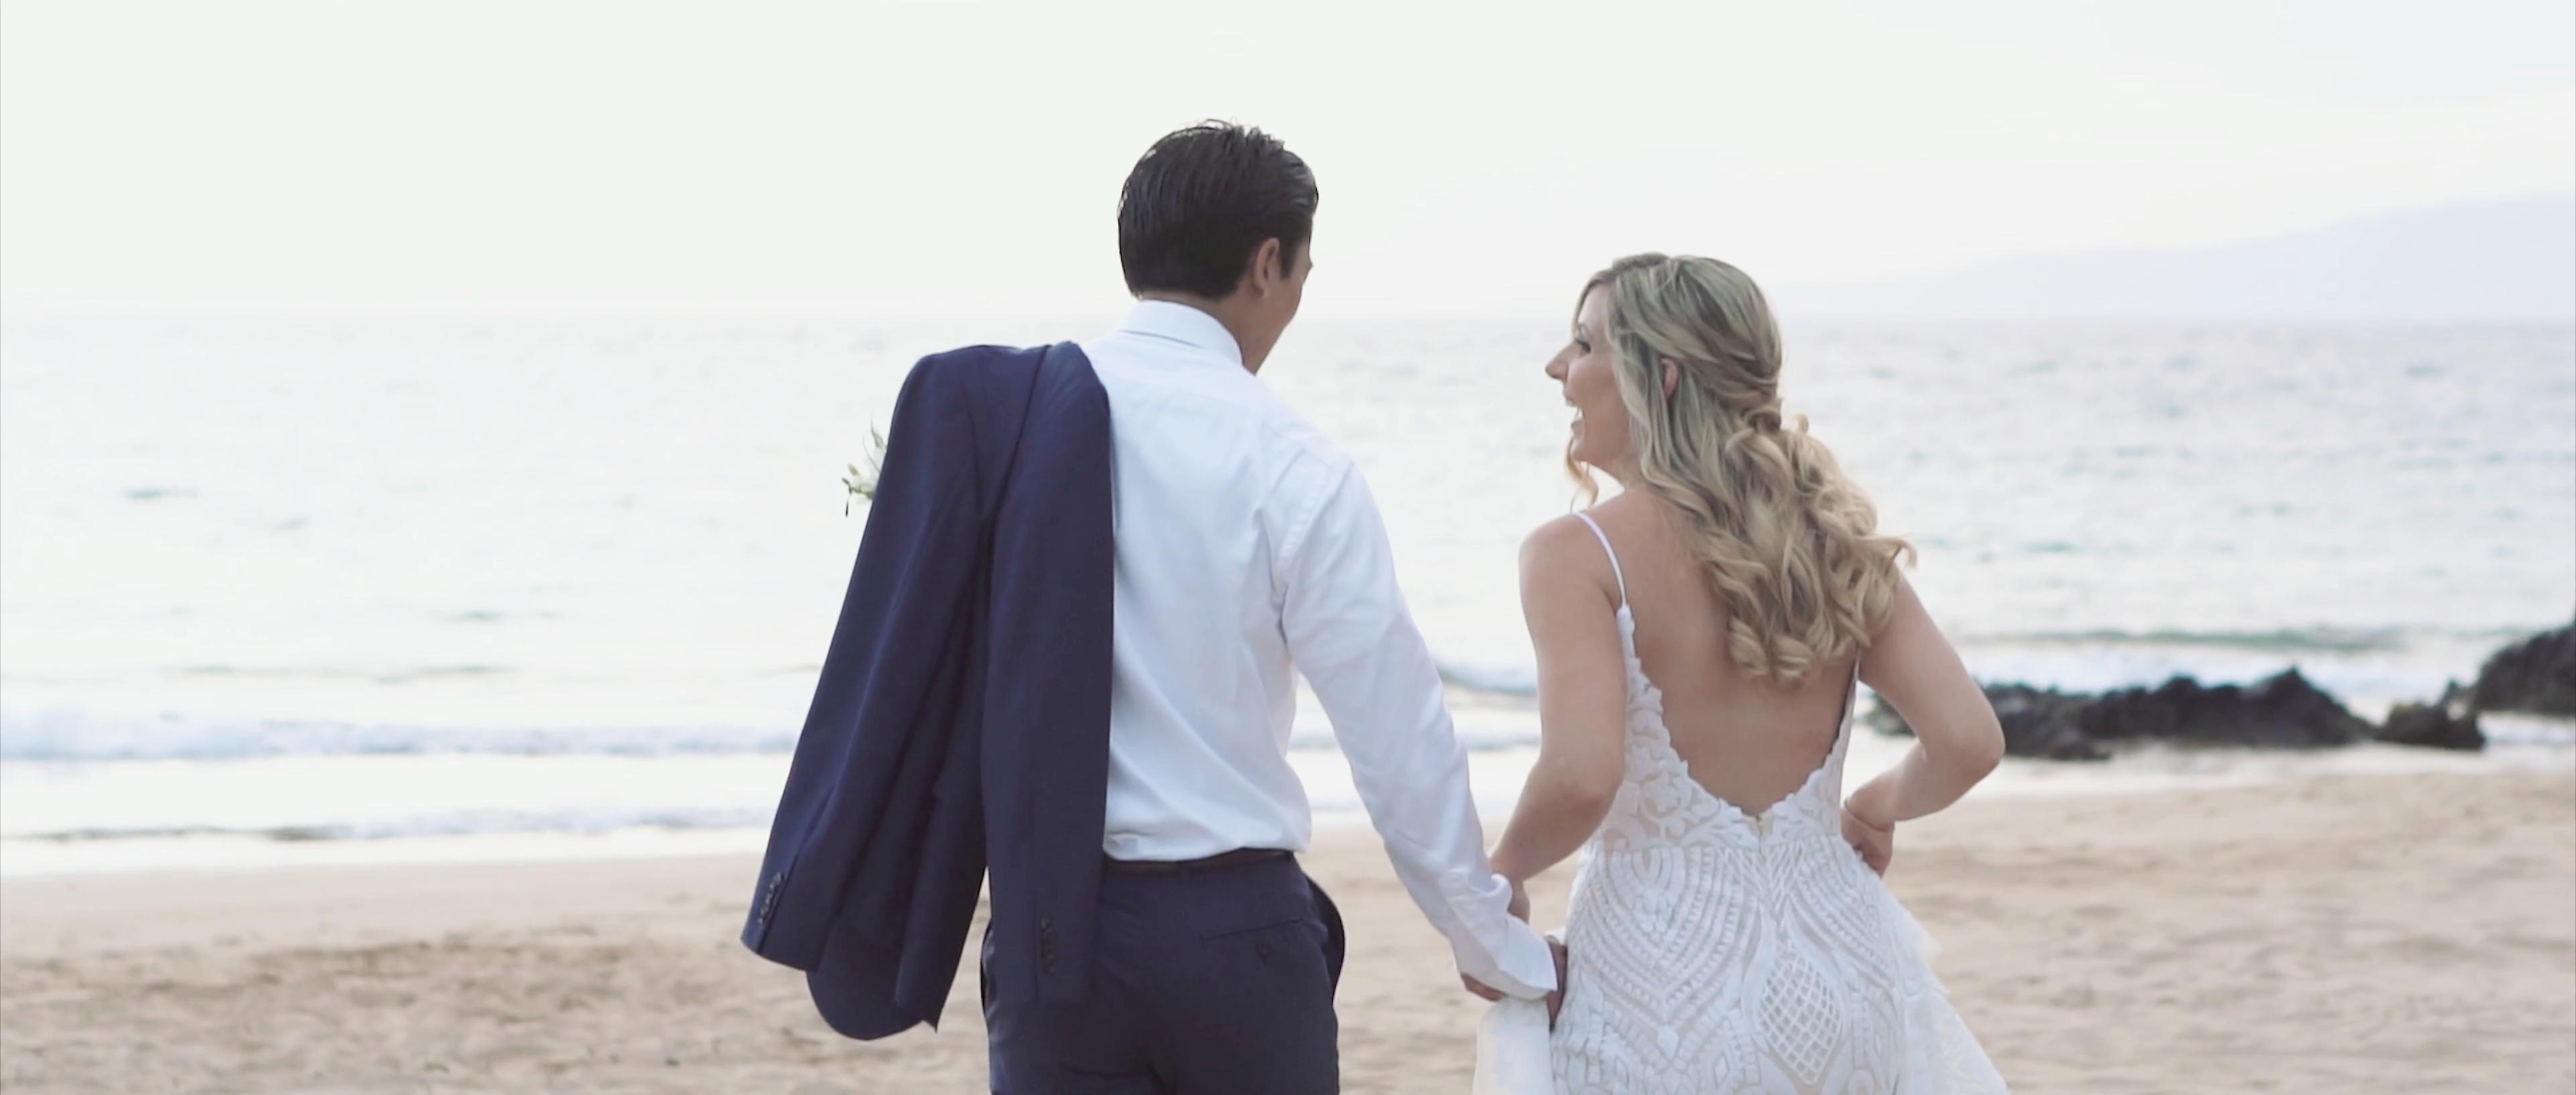 Rebecca + Brian | Wailea-Makena, Hawaii | Fairmont Kea Lani